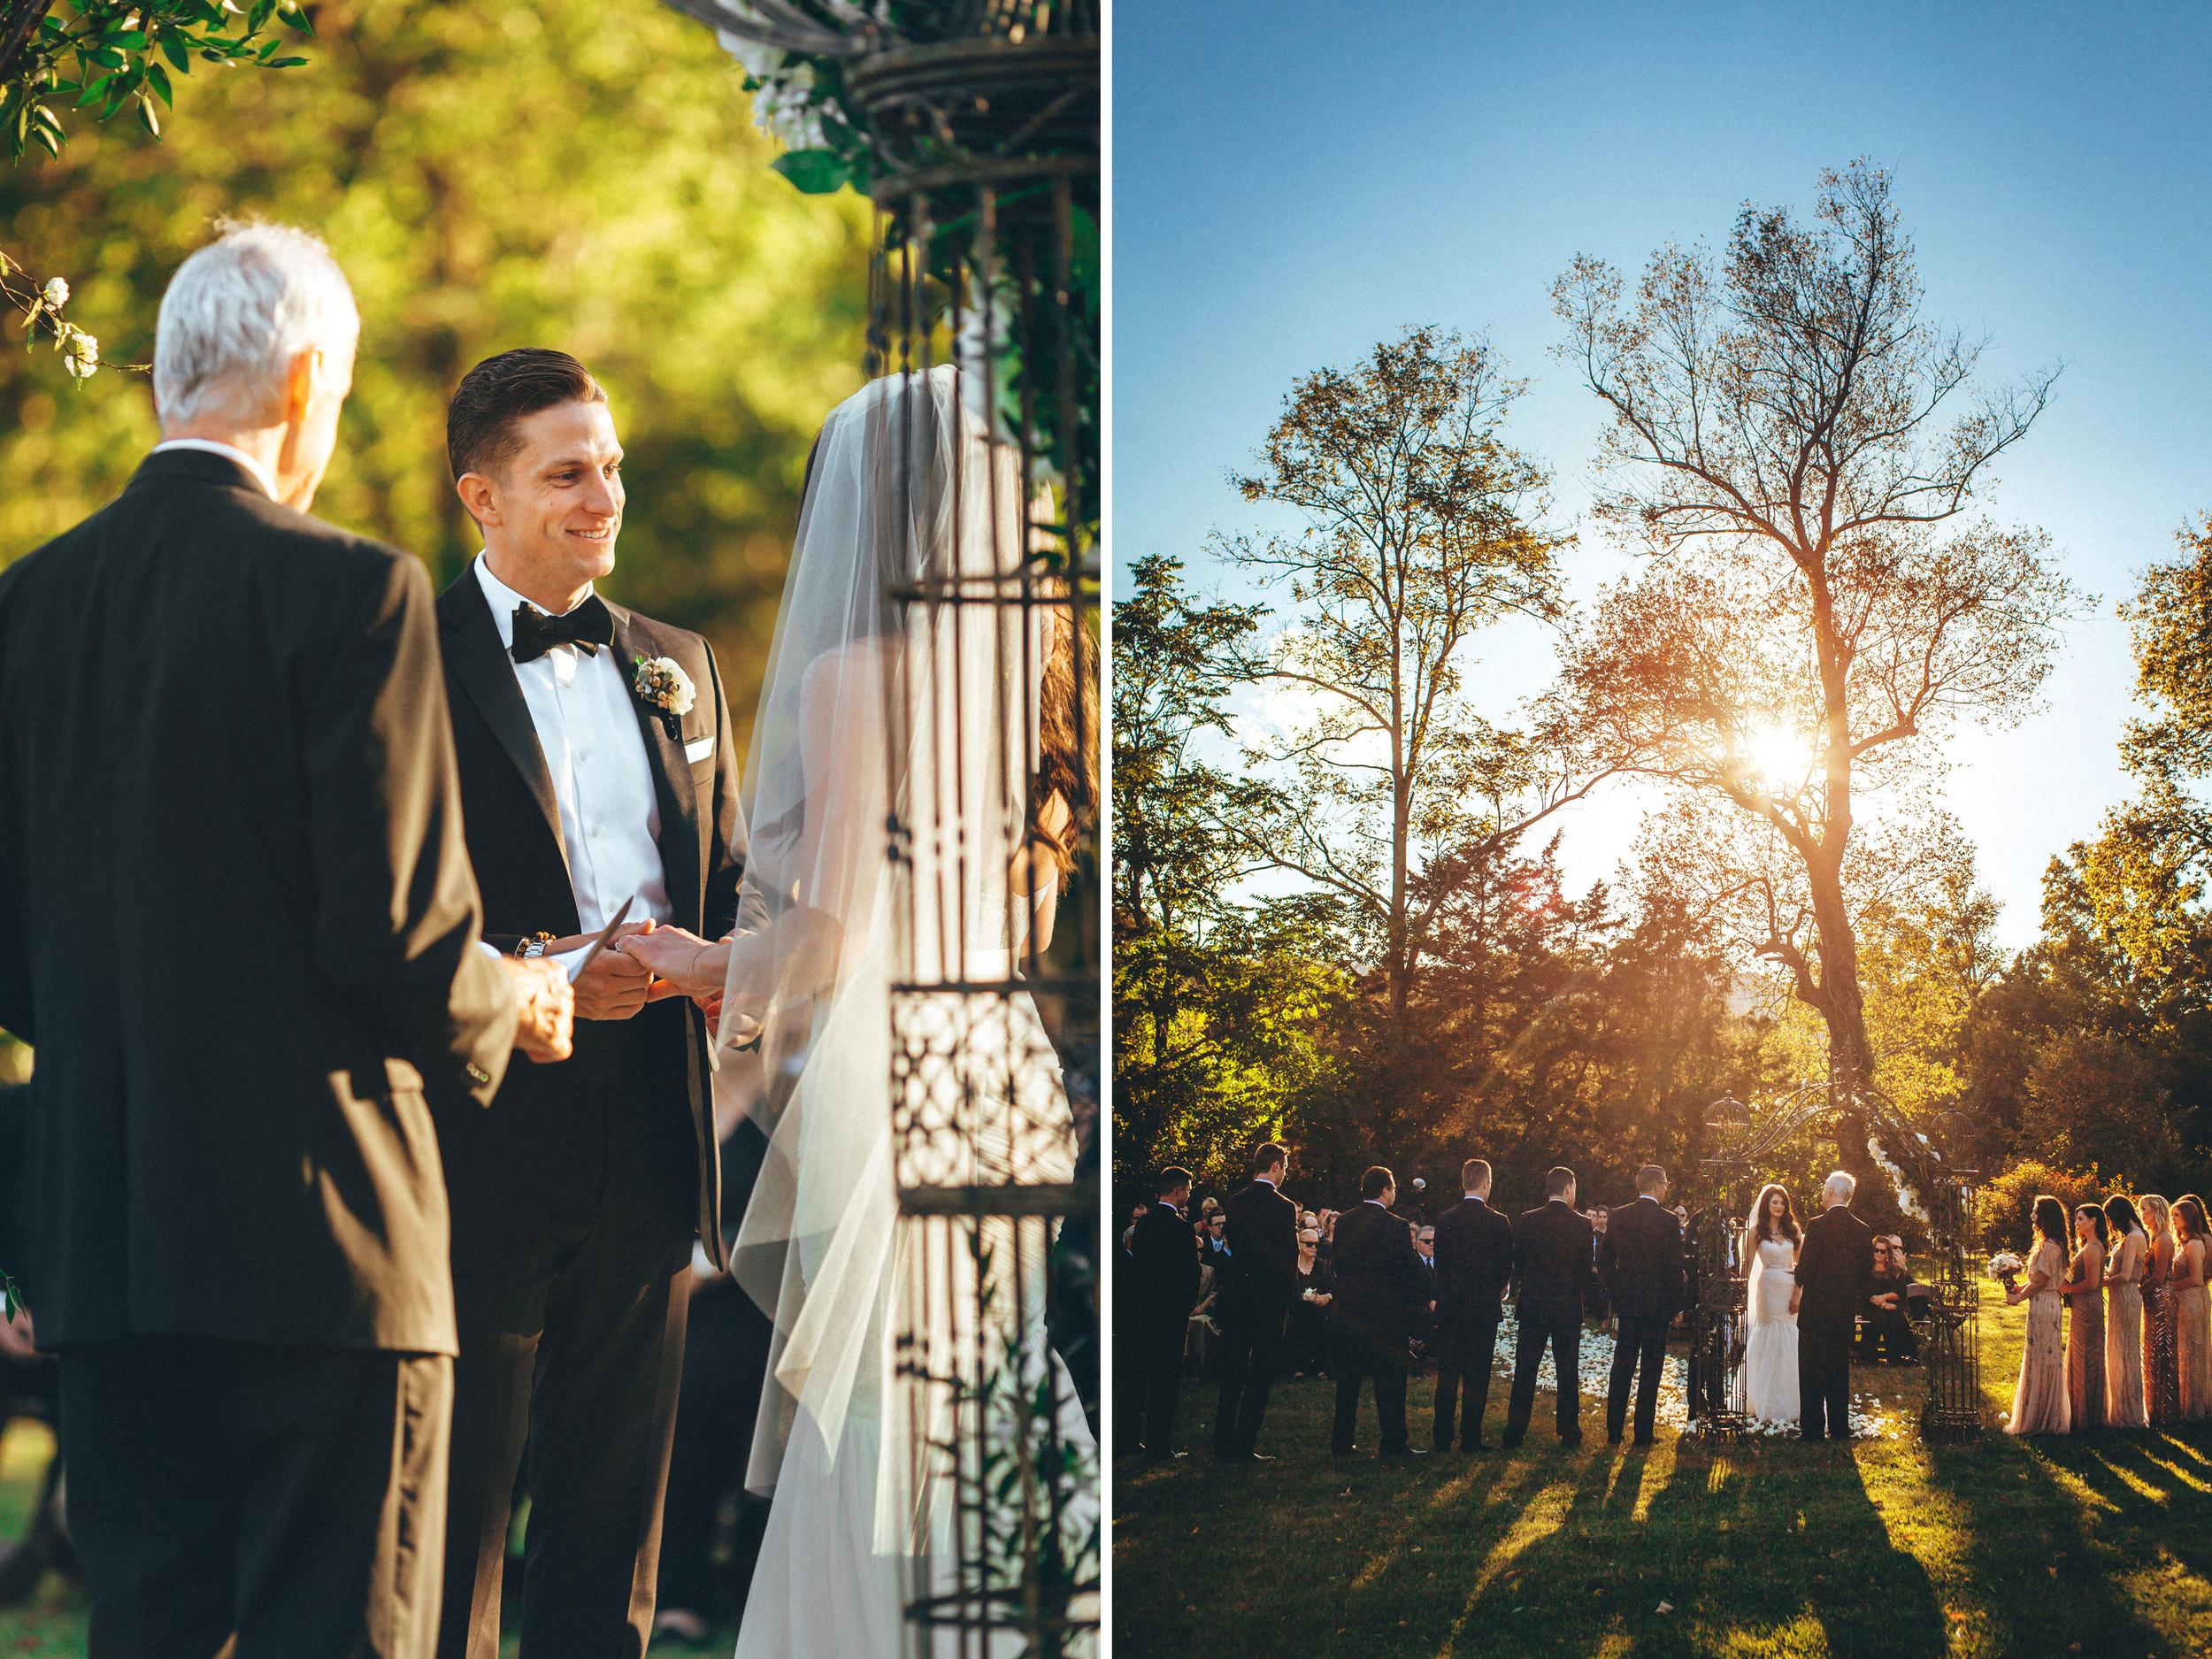 Me & Mr. Jones Wedding, I Dos, Ballet Length Veil, Love Veil,  Fountain Veil